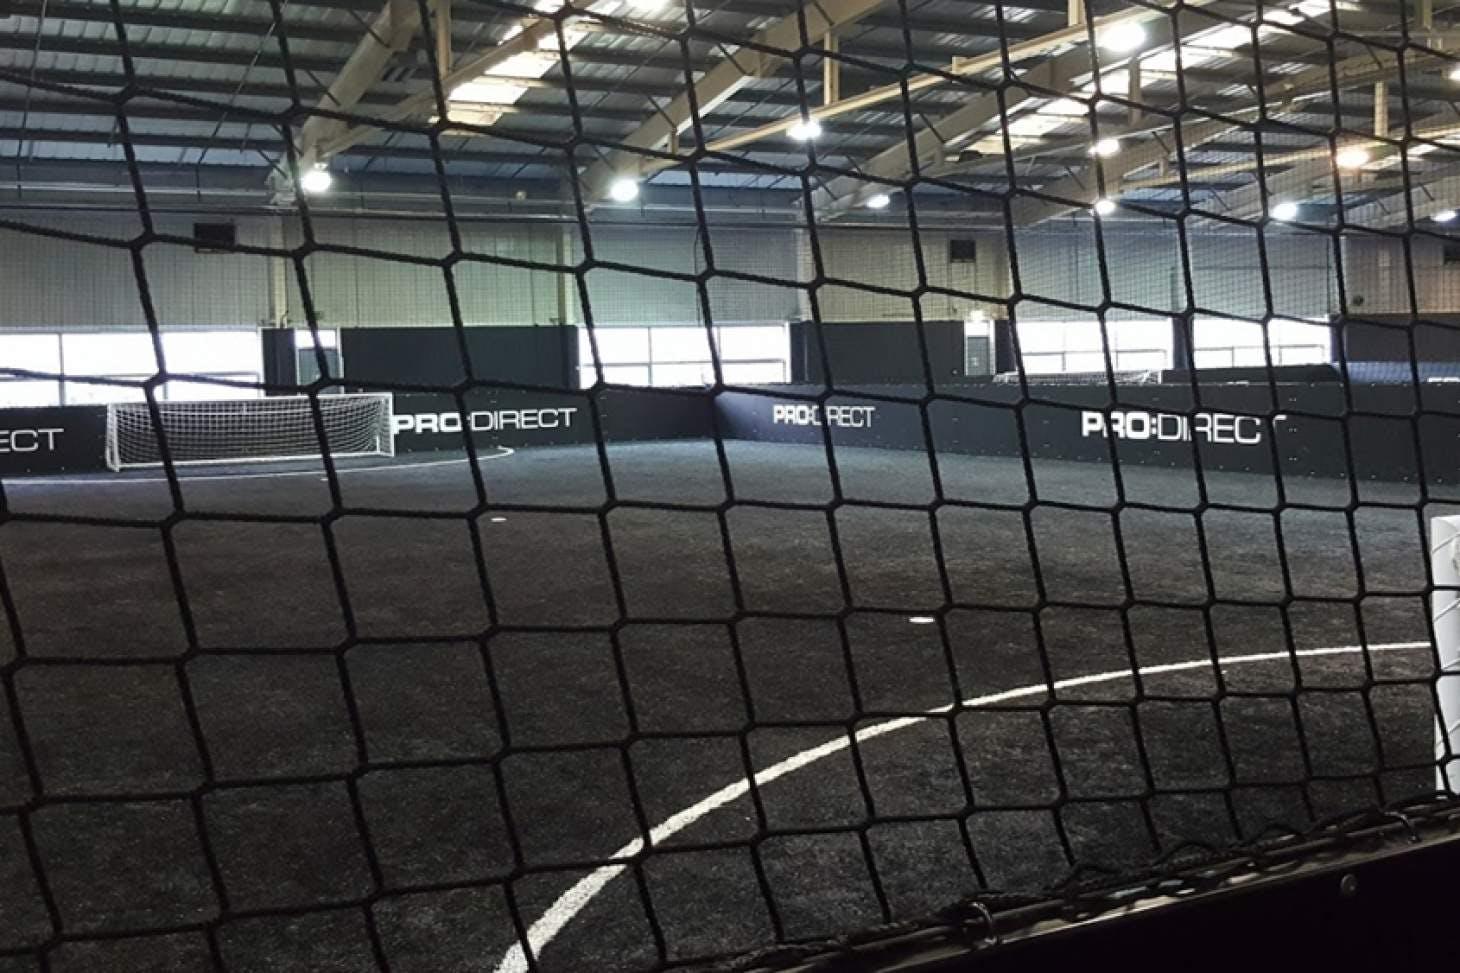 PlayFootball Birmingham 5 a side | 3G Astroturf football pitch